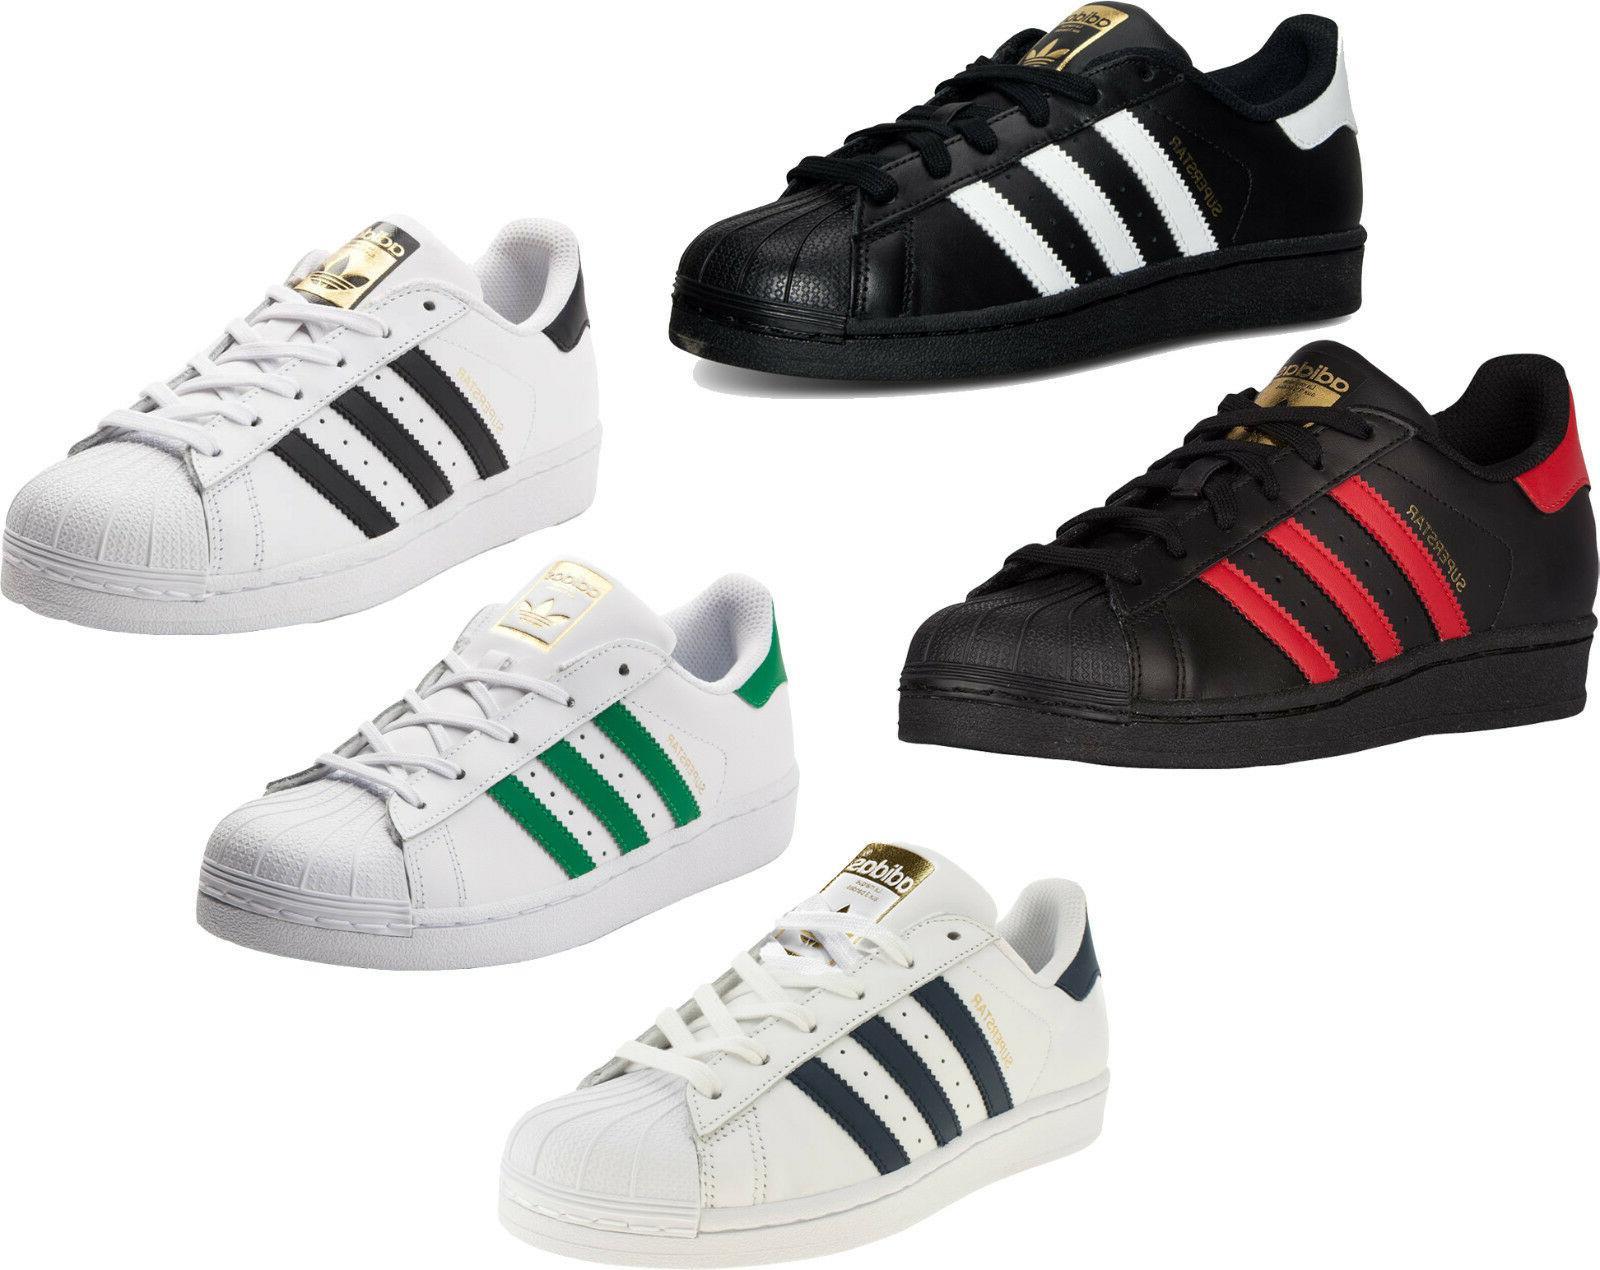 Adidas Originals Superstar J Shoes Kids Sneakers White Black